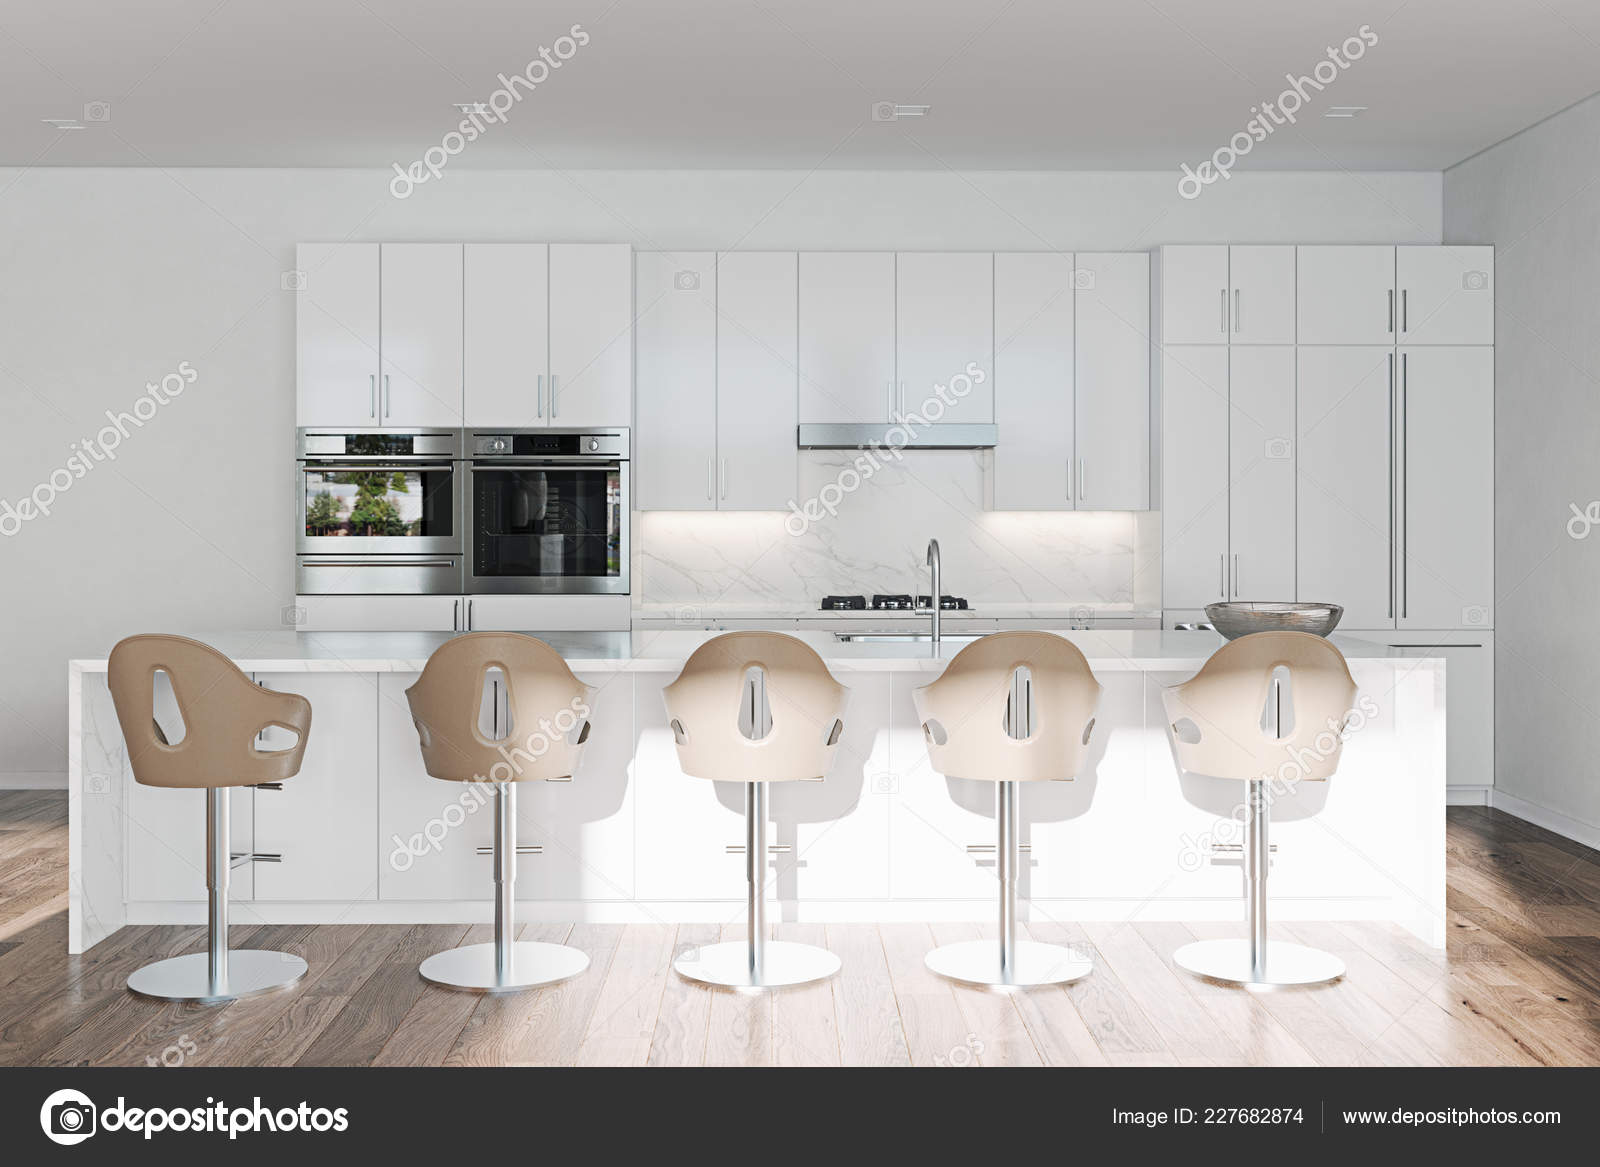 islands for the kitchen picture 空荡荡的干净的白色厨房与岛屿和酒吧3d 图库照片 c viz arch 227682874